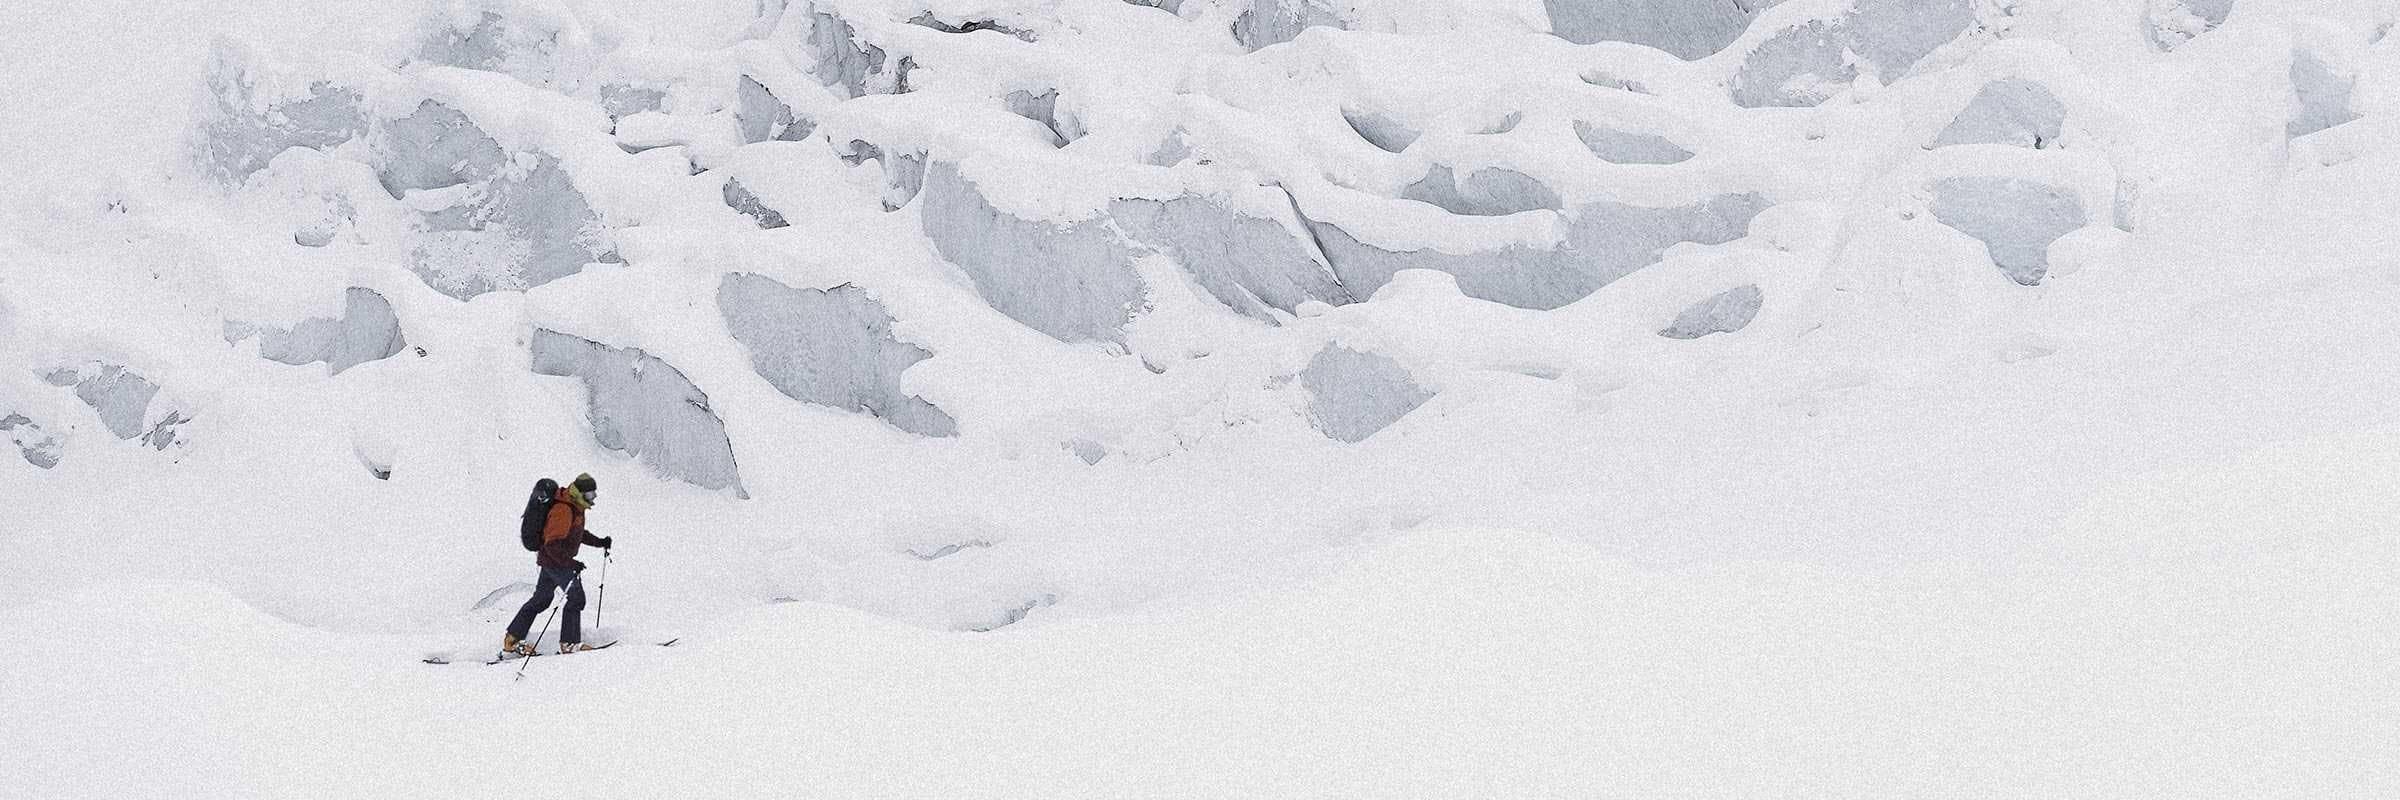 Best Arc'teryx Men's Ski & Snowboard Jackets for Winter 2019